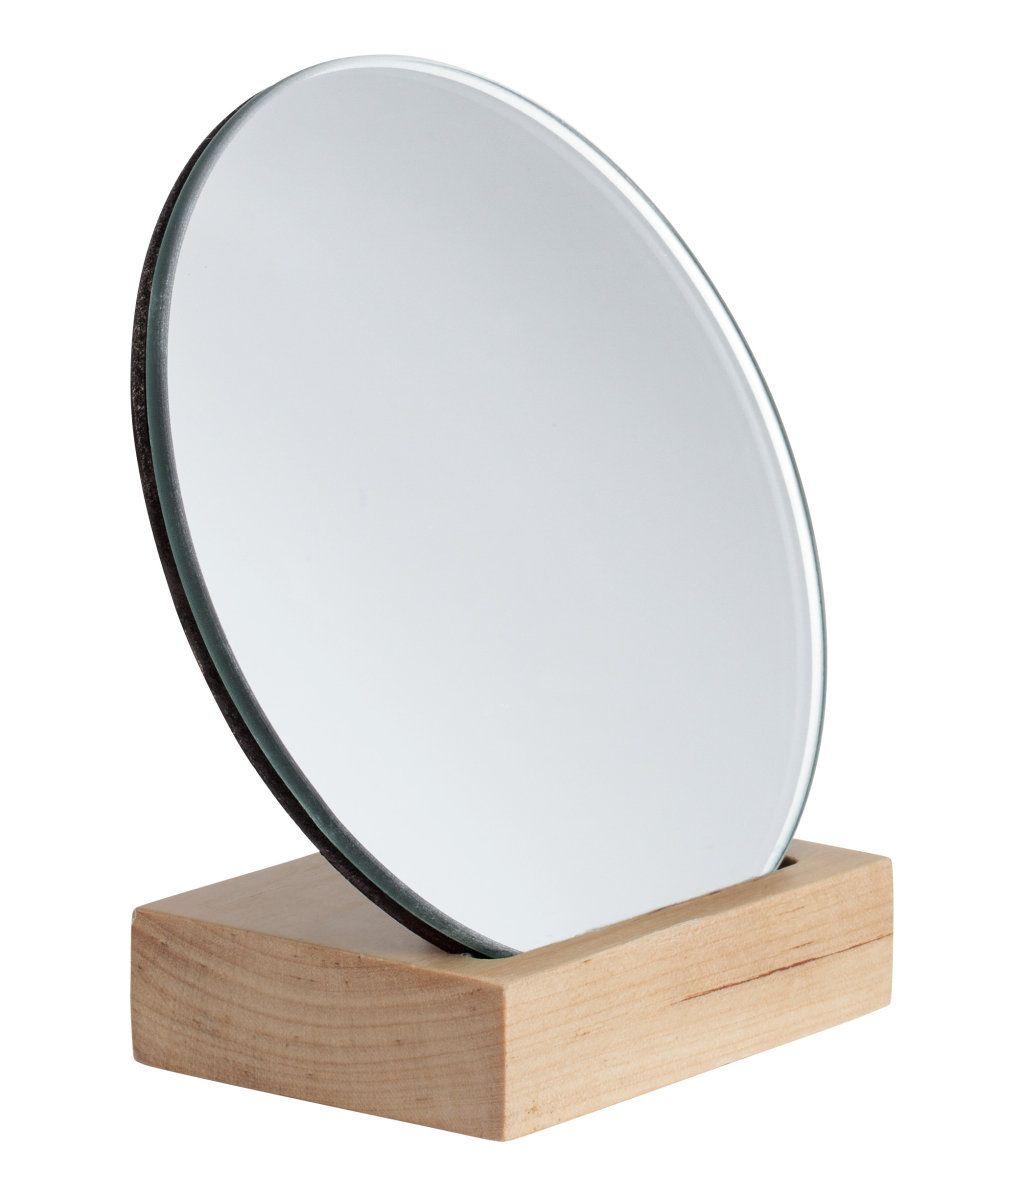 Runder Spiegel Natur Home Hm De Wohnideen Small